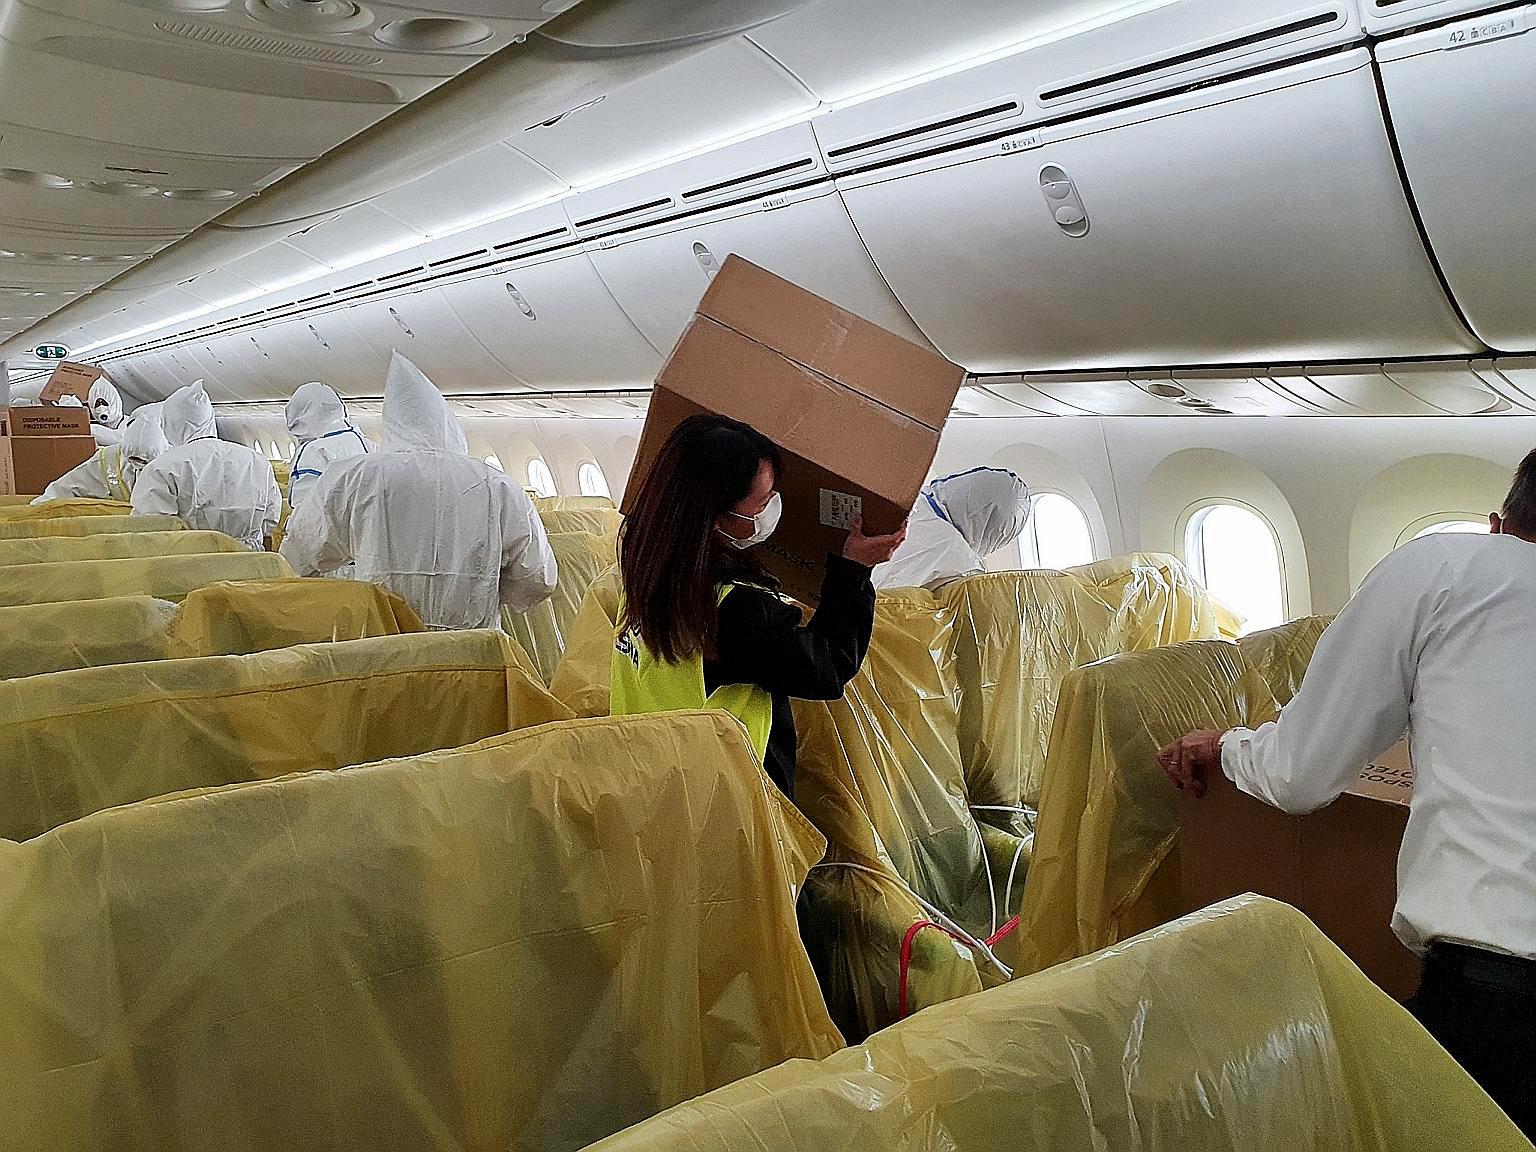 SIA Cargo in cabin (Singapore Airlines)